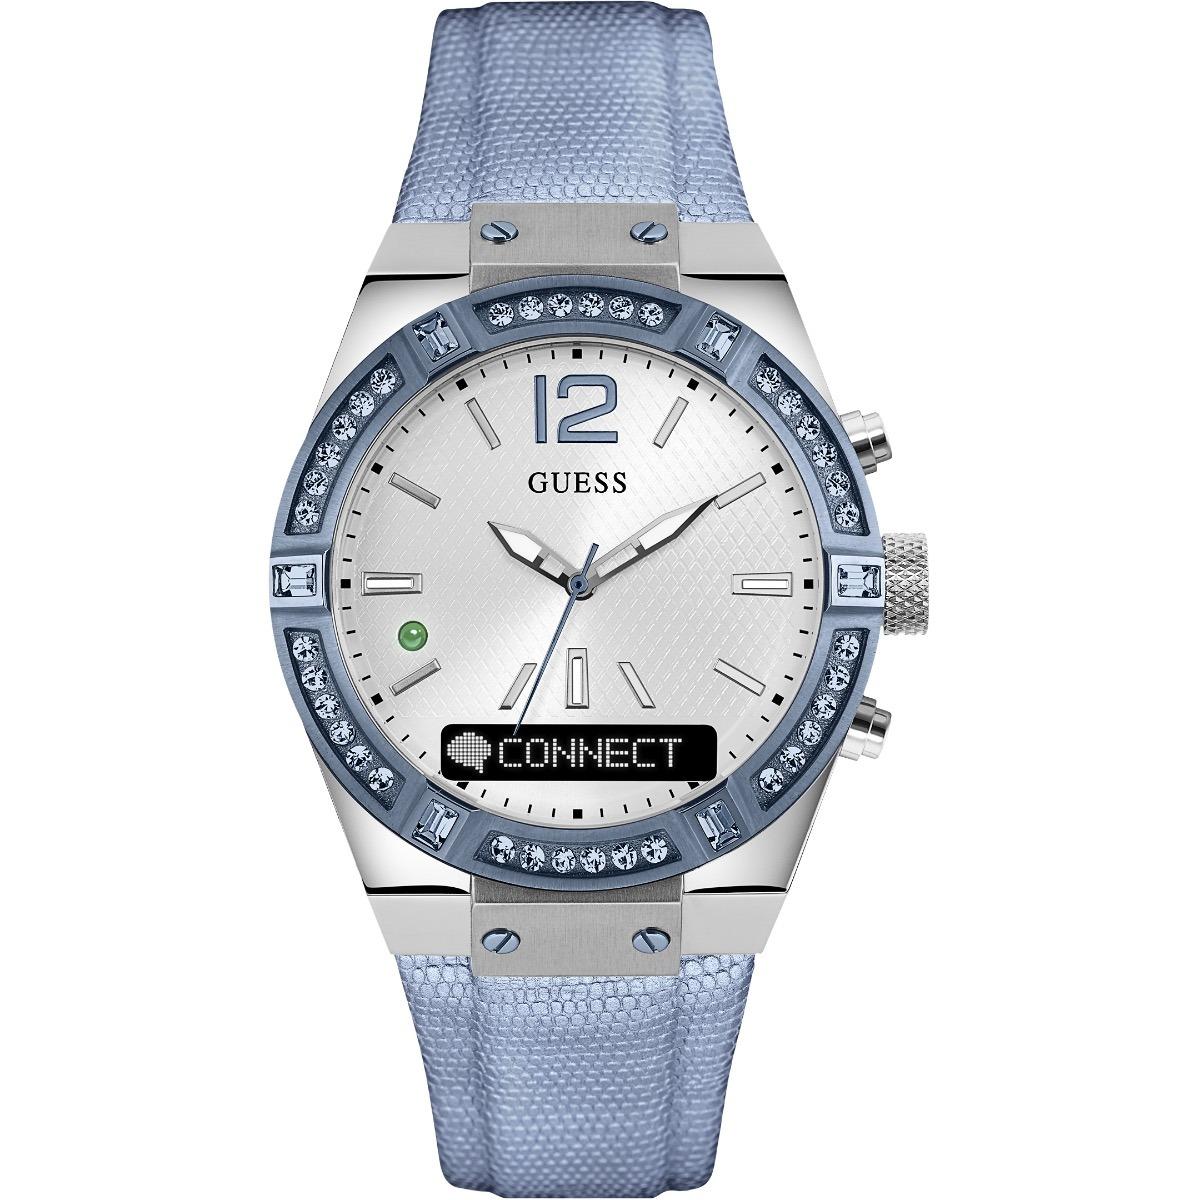 Smartwatch Guess Smartwatch Reloj Guess Reloj Guess Smartwatch Reloj Reloj 9IYEWHD2